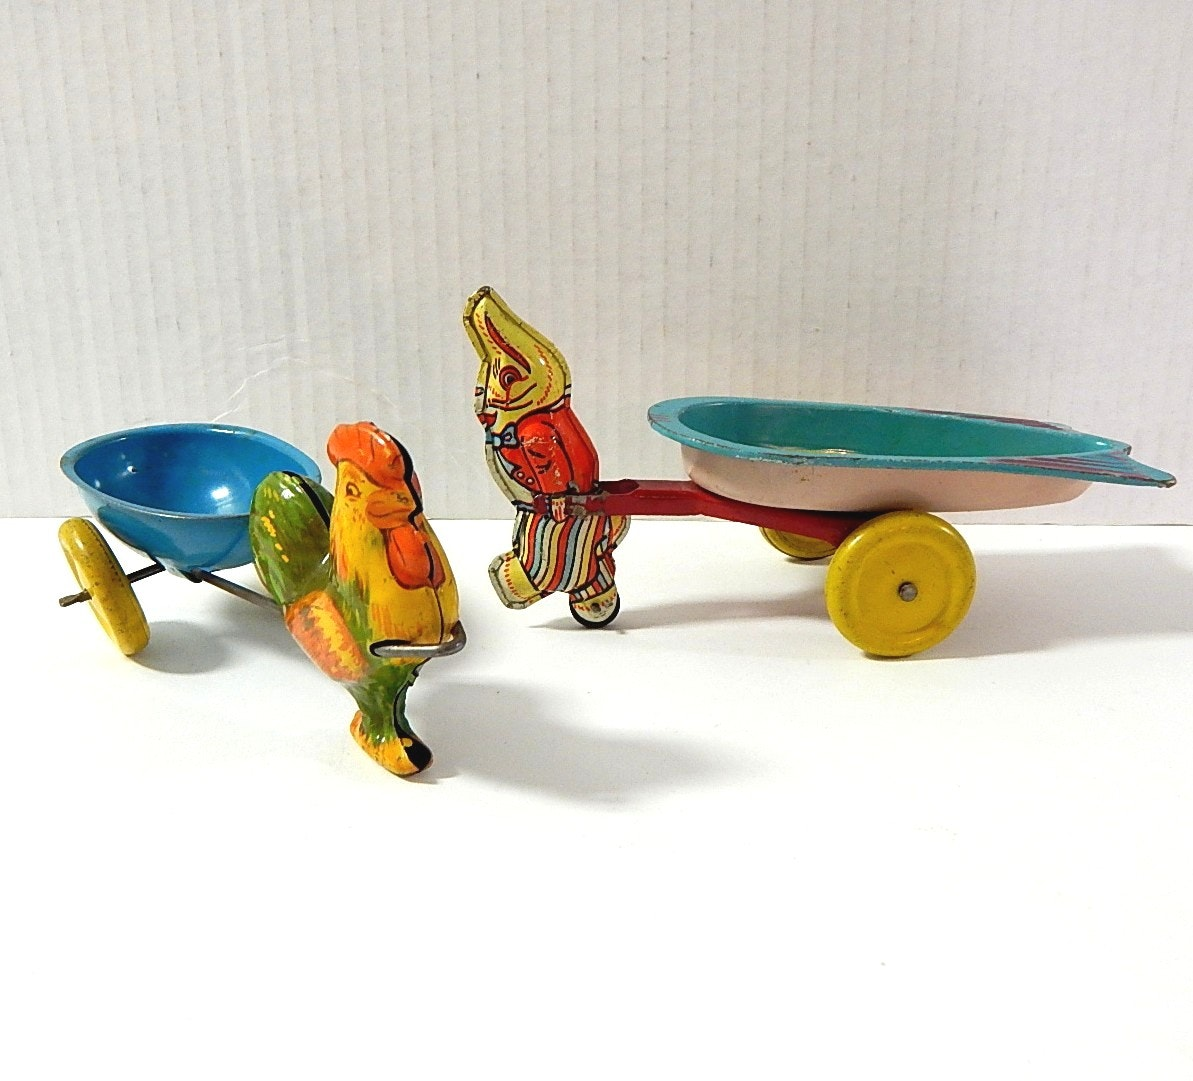 Two Vintage Tin Litho Easter Toys with 1930s Wyandotte